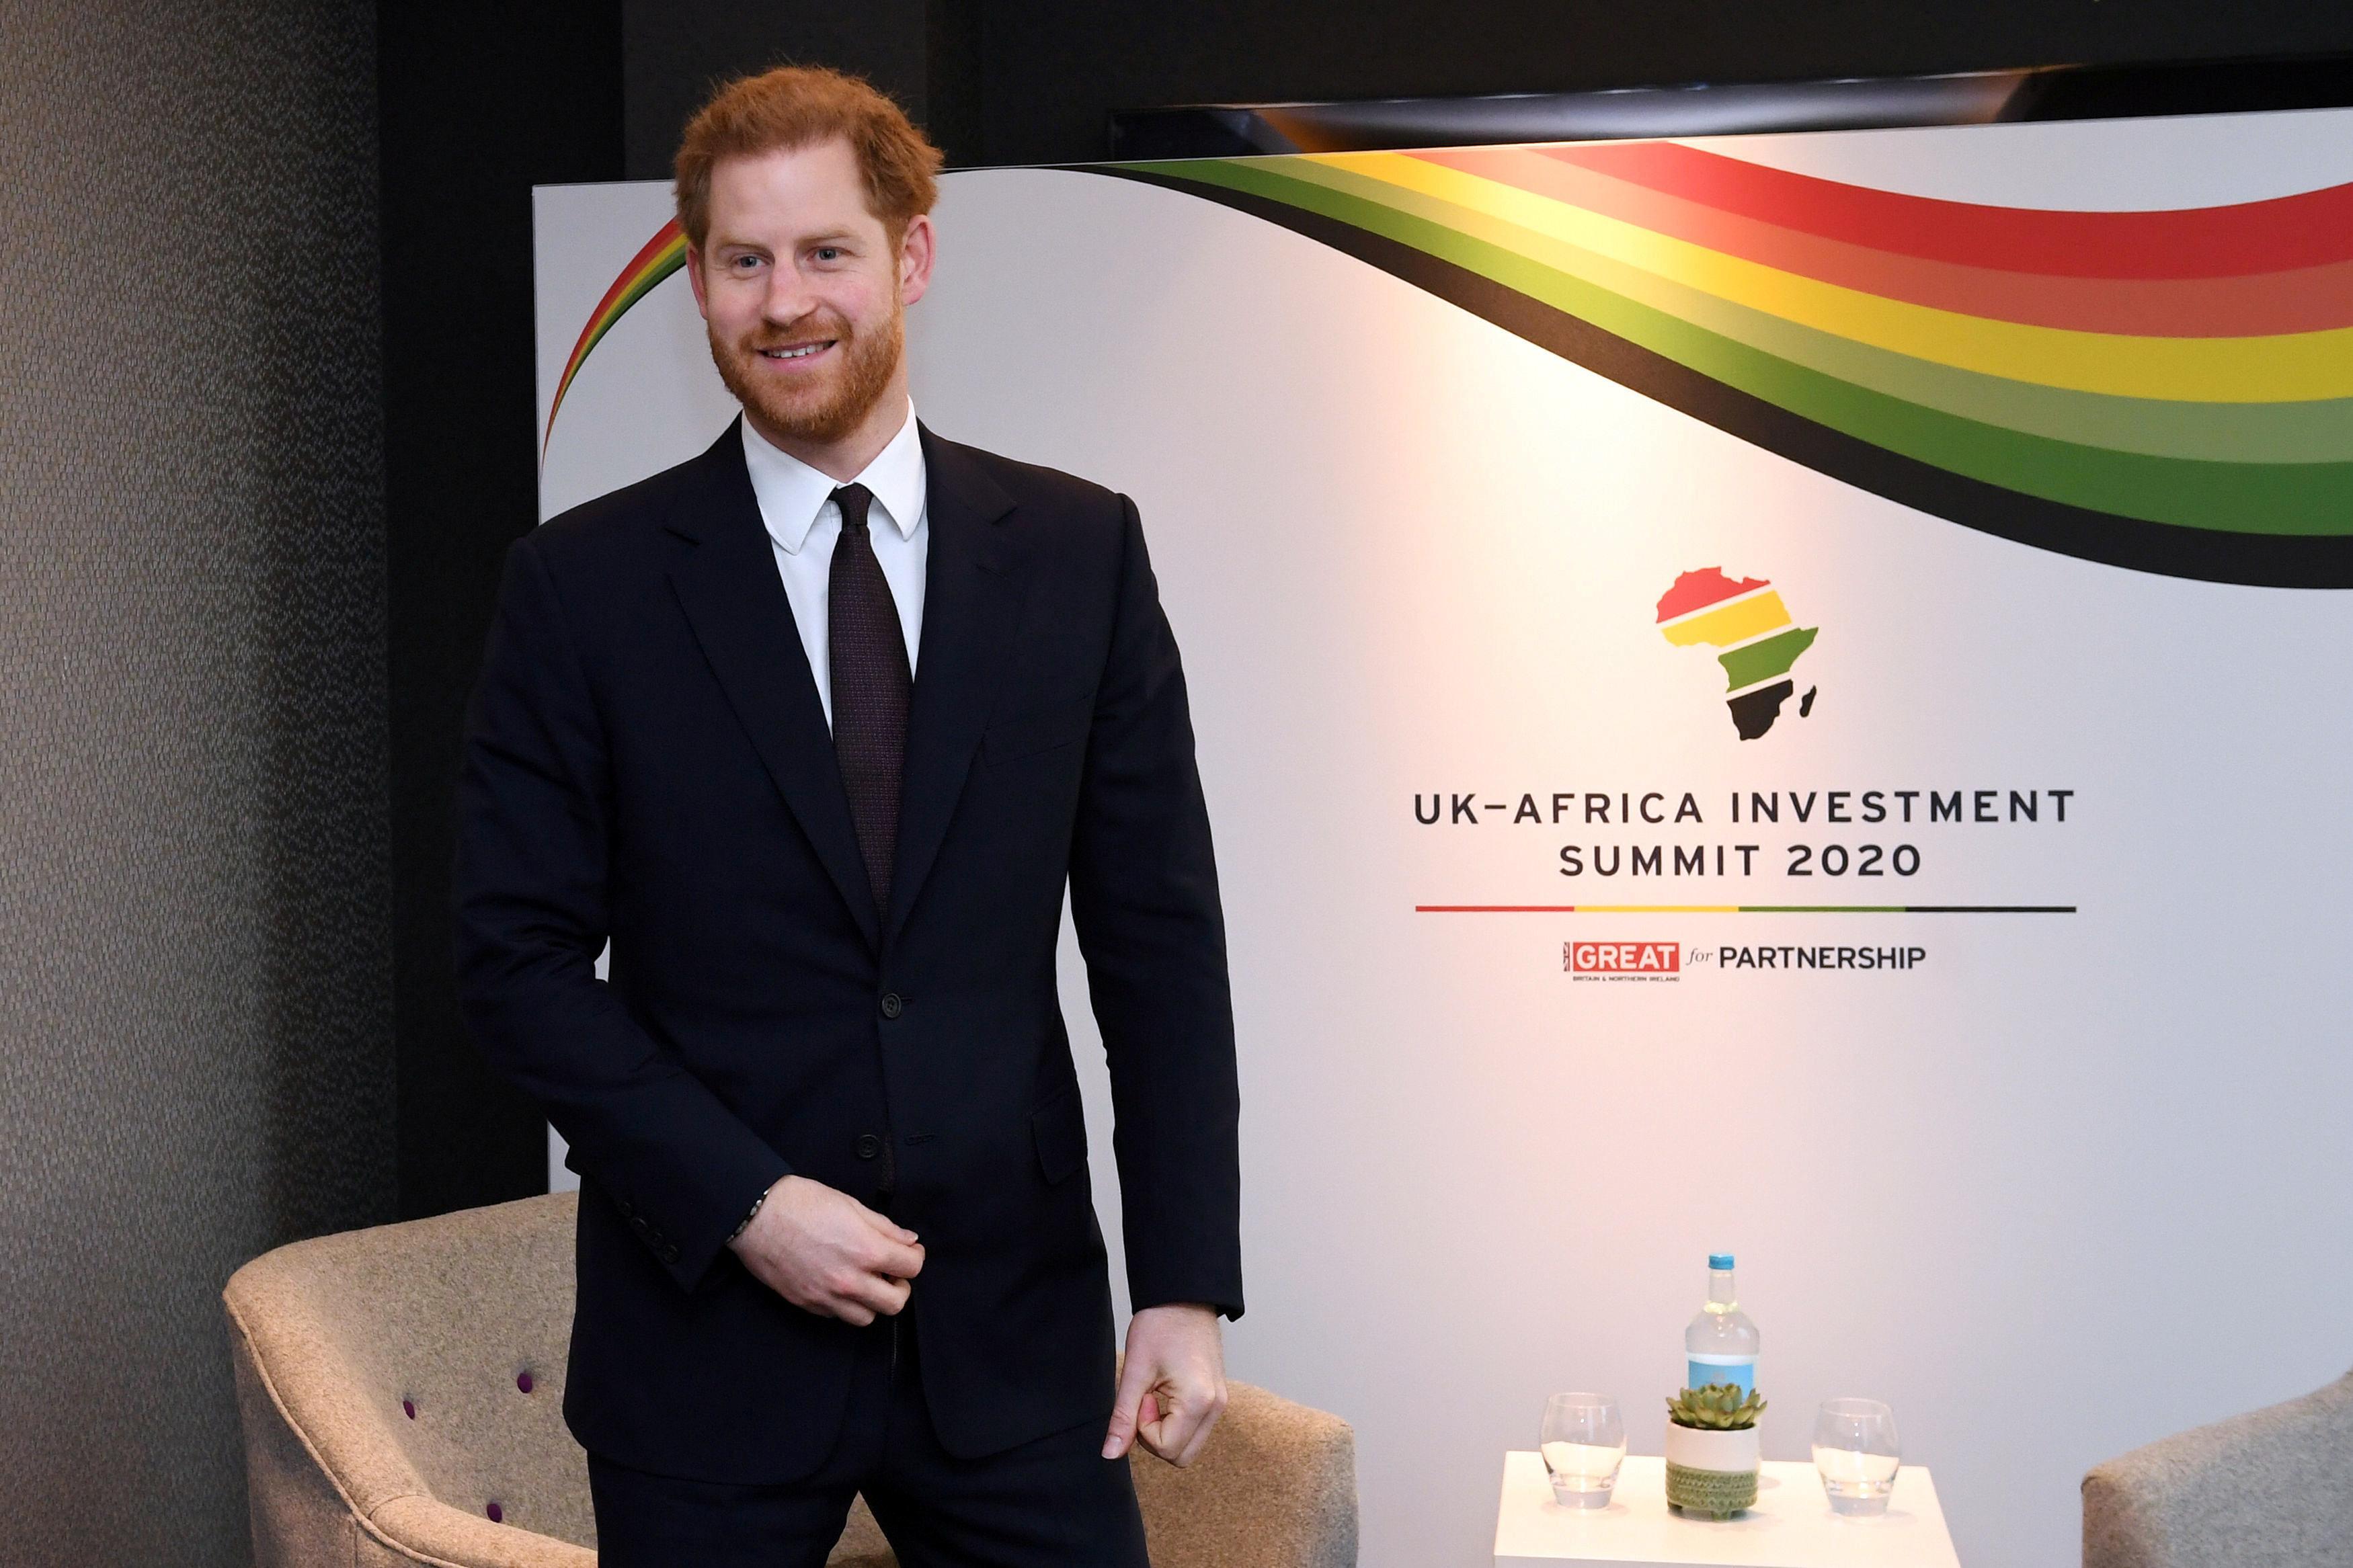 UK's Prince Harry and Meghan warn media over paparazzi shots